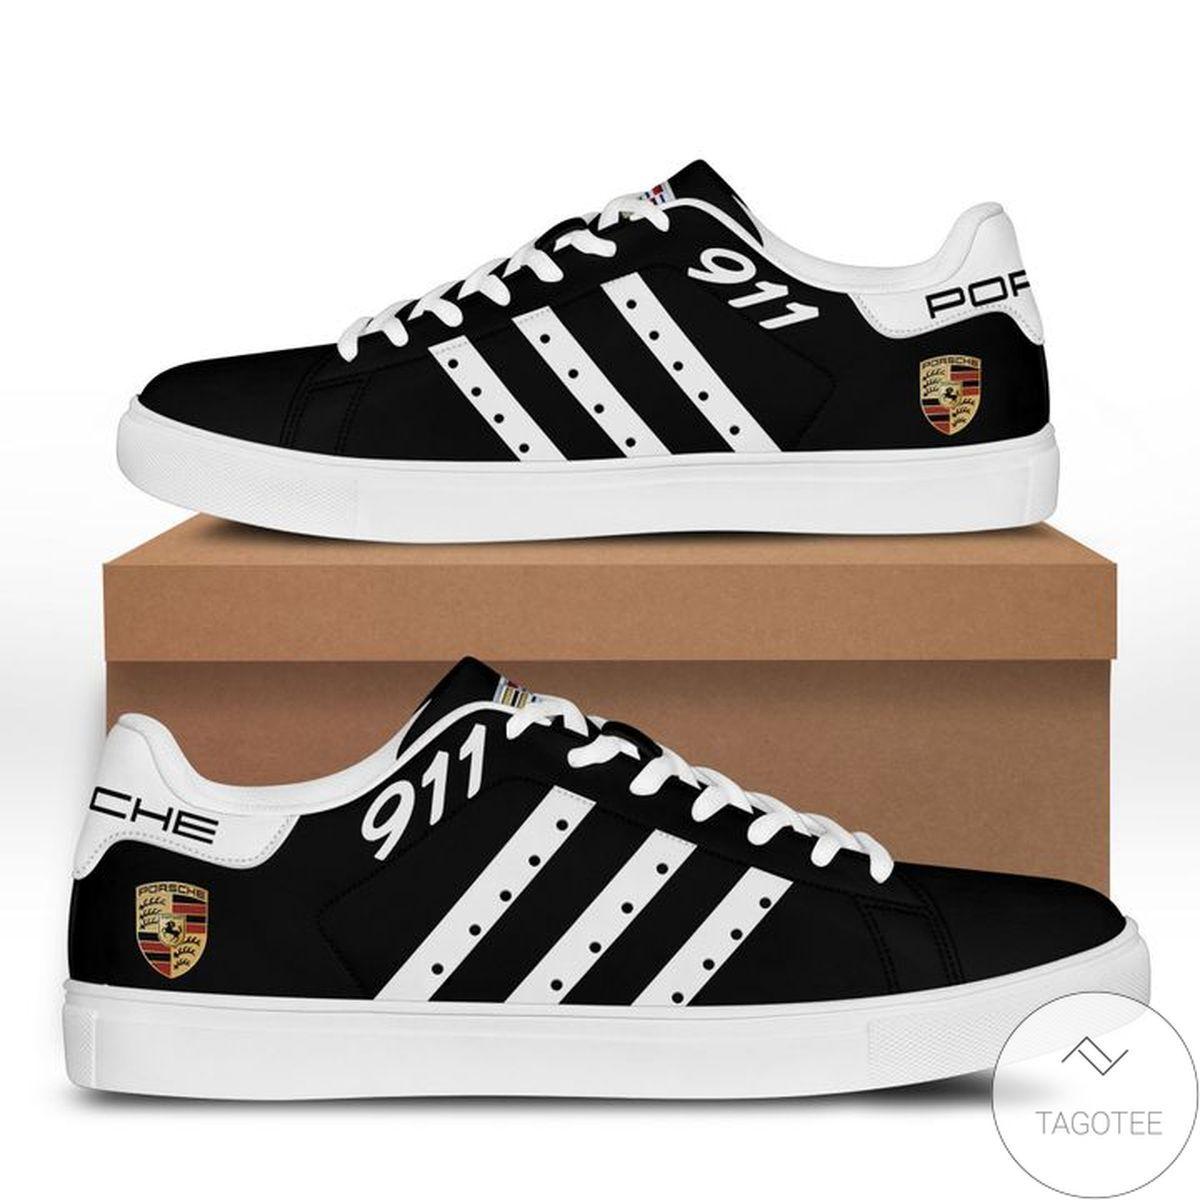 Gorgeous Porsche All Black Stan Smith Shoes